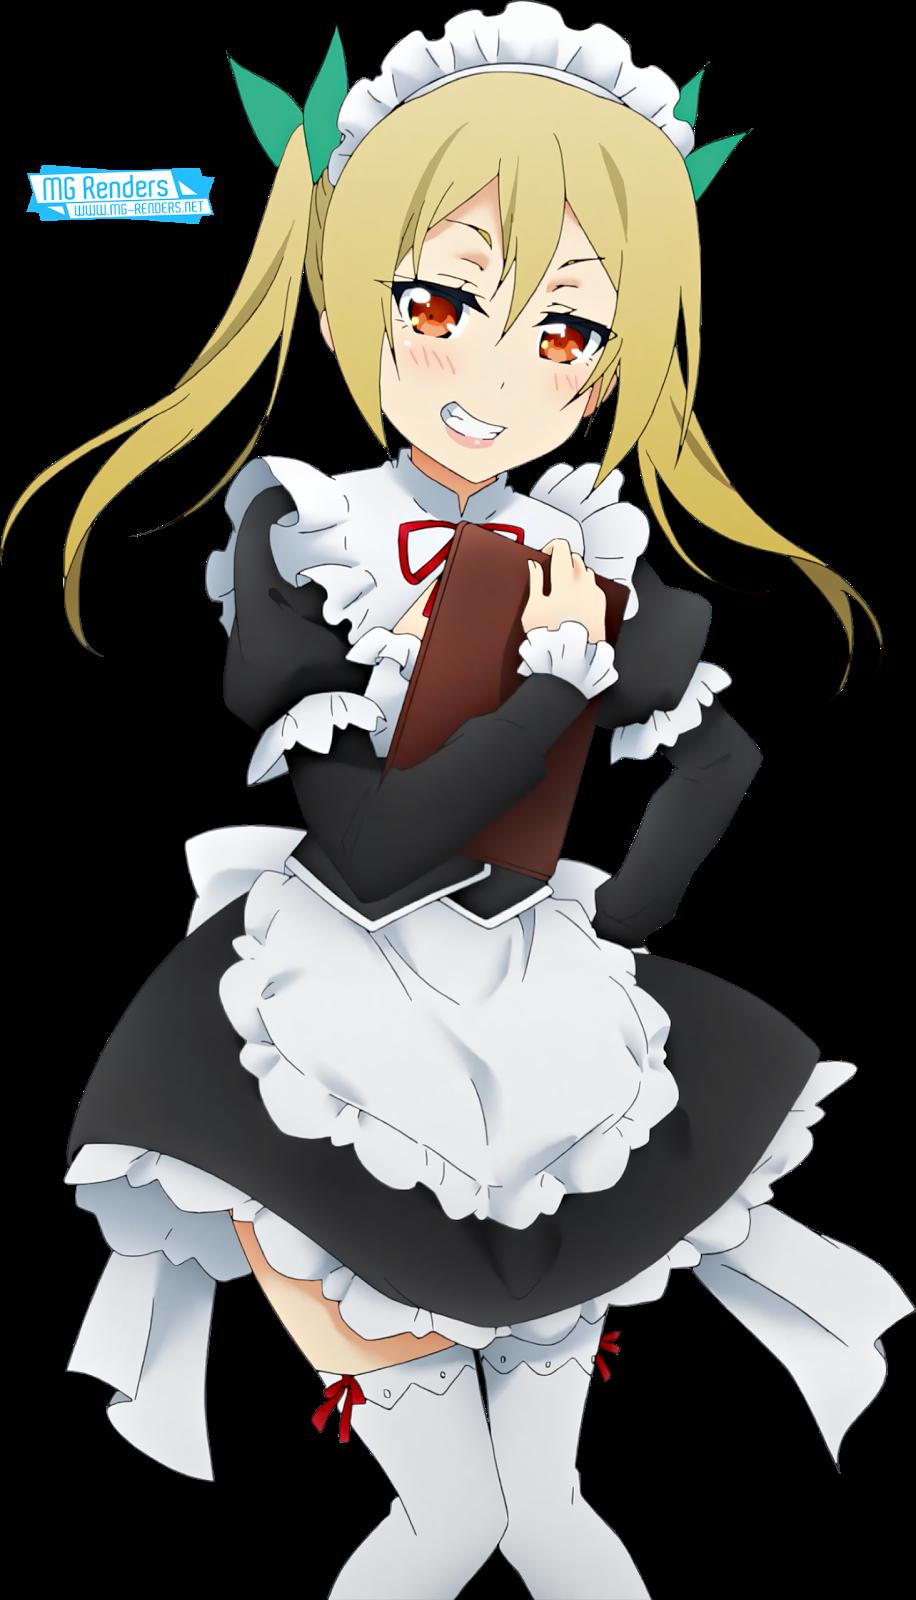 Tags: Anime, Render,  Dress,  Maid,  Netoge no Yome wa Onnanoko ja Nai to Omotta,  Segawa Akane,  Skirt,  Small breasts,  PNG, Image, Picture